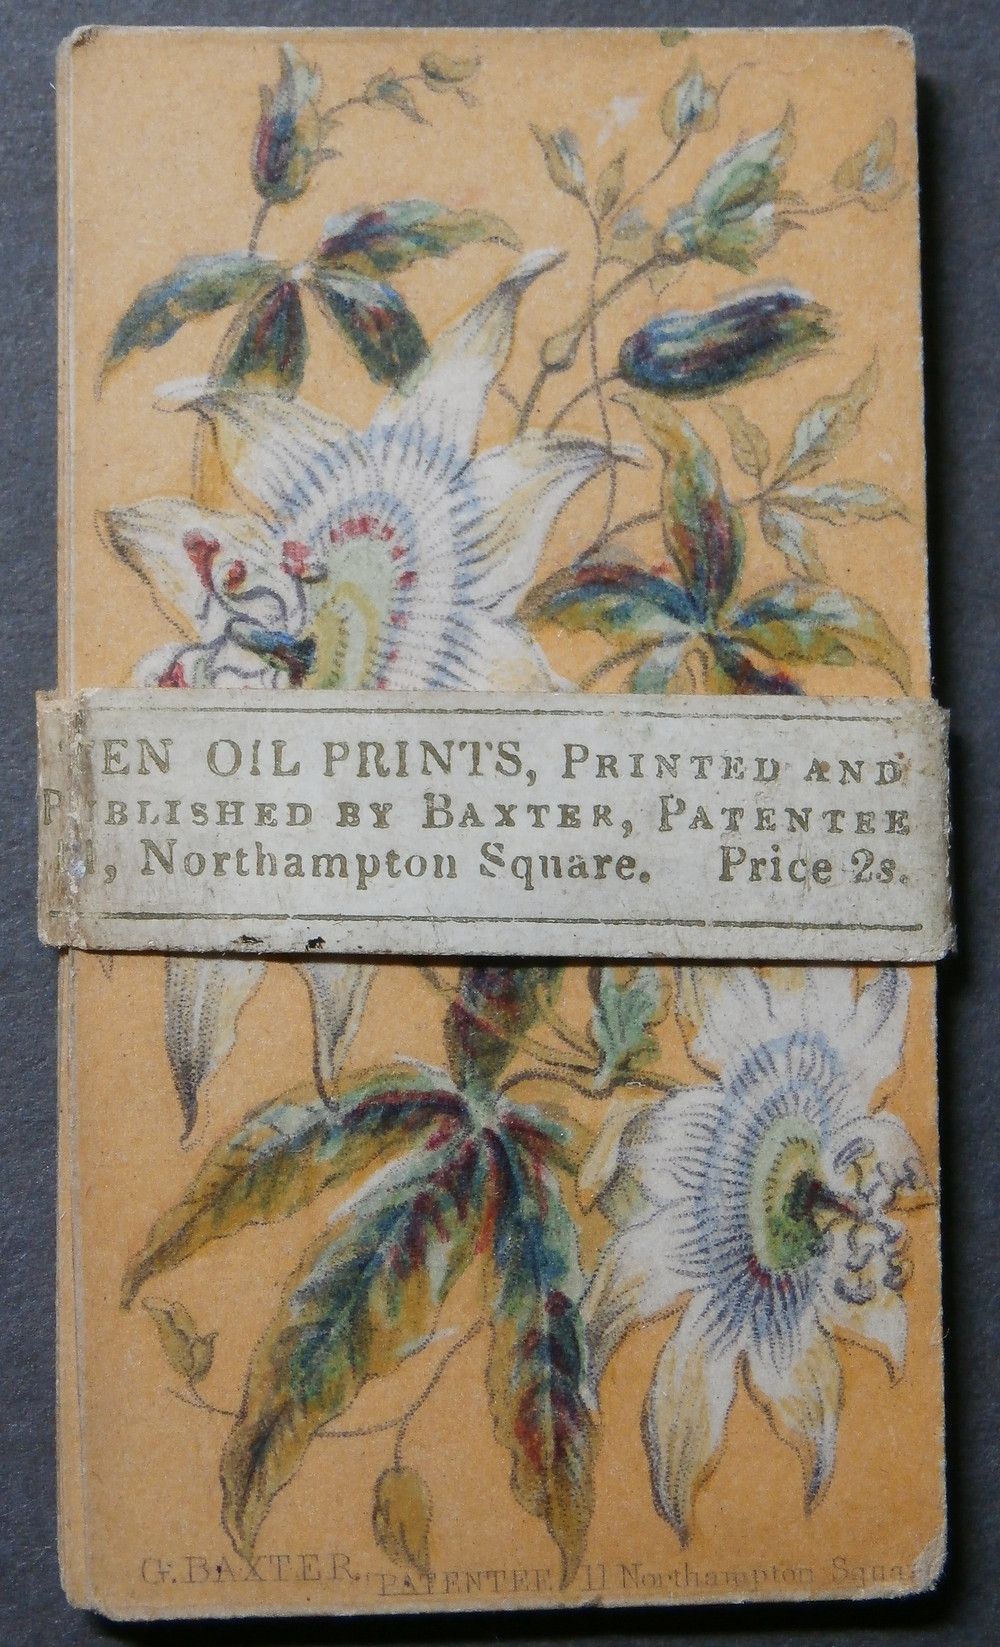 Baxter OIl Prints in original wrapper